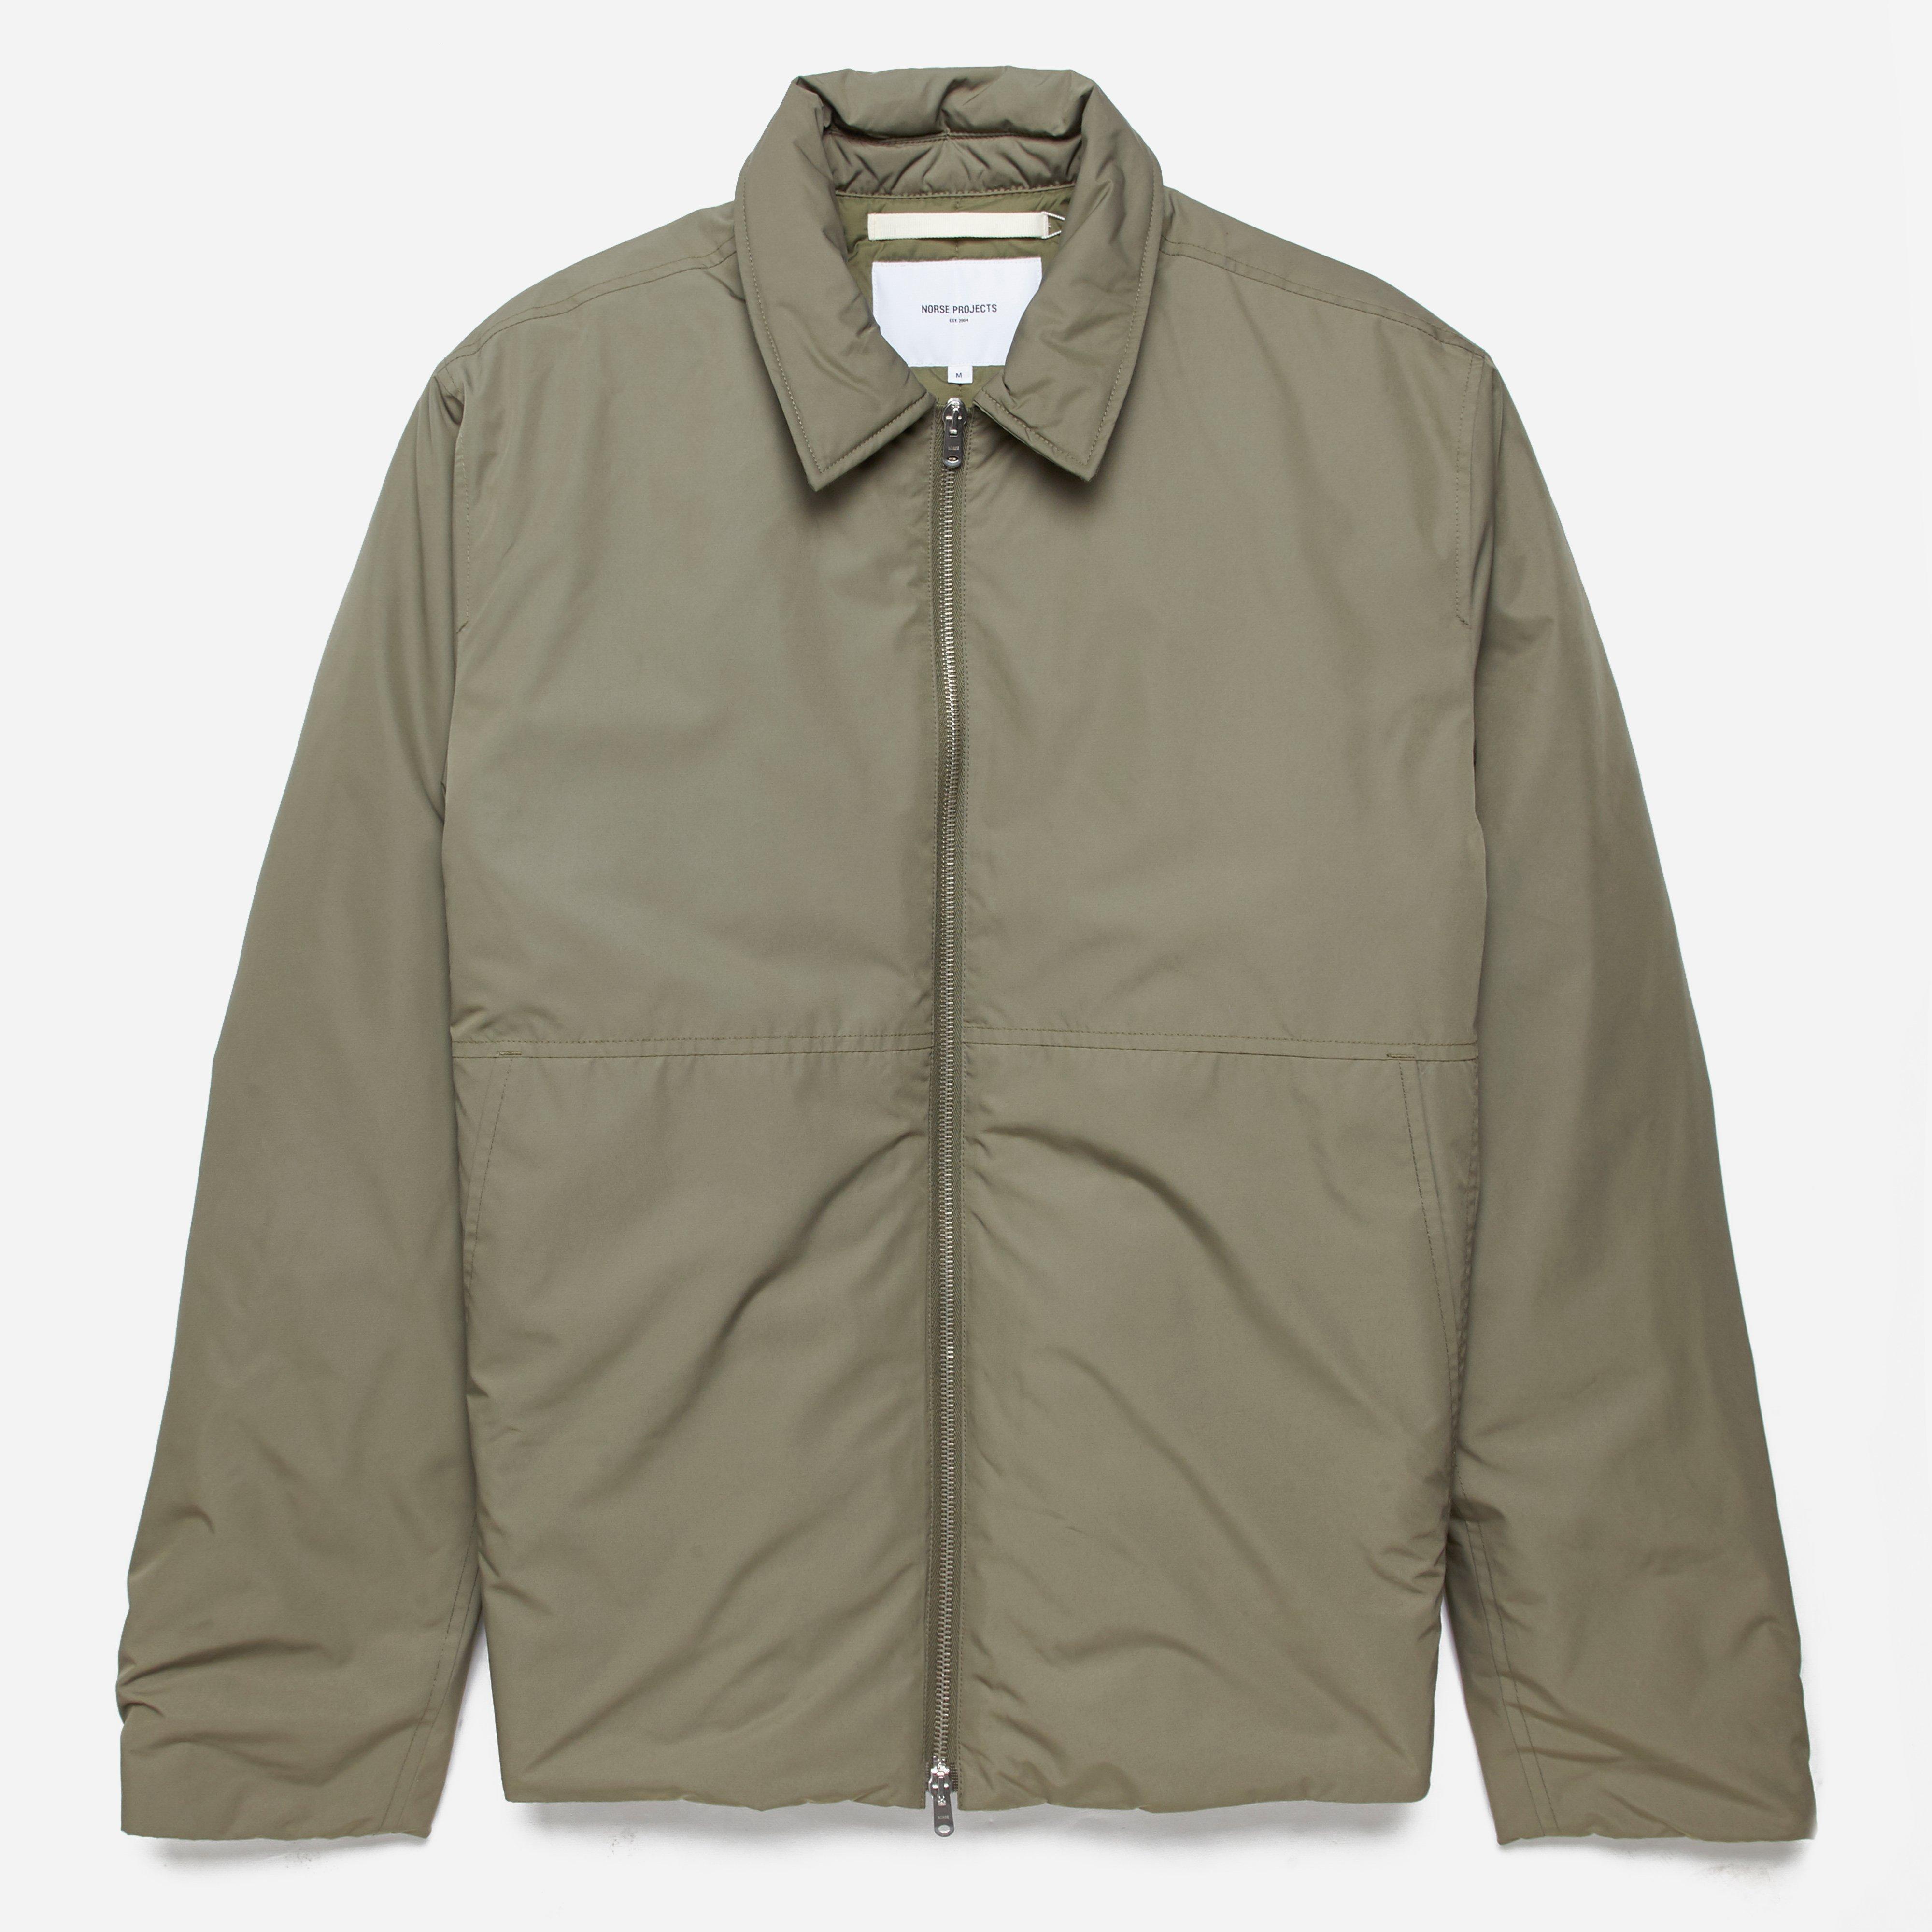 Norse Projects Synthetic Elliot Nylon Jacket in Khaki (Green) for Men